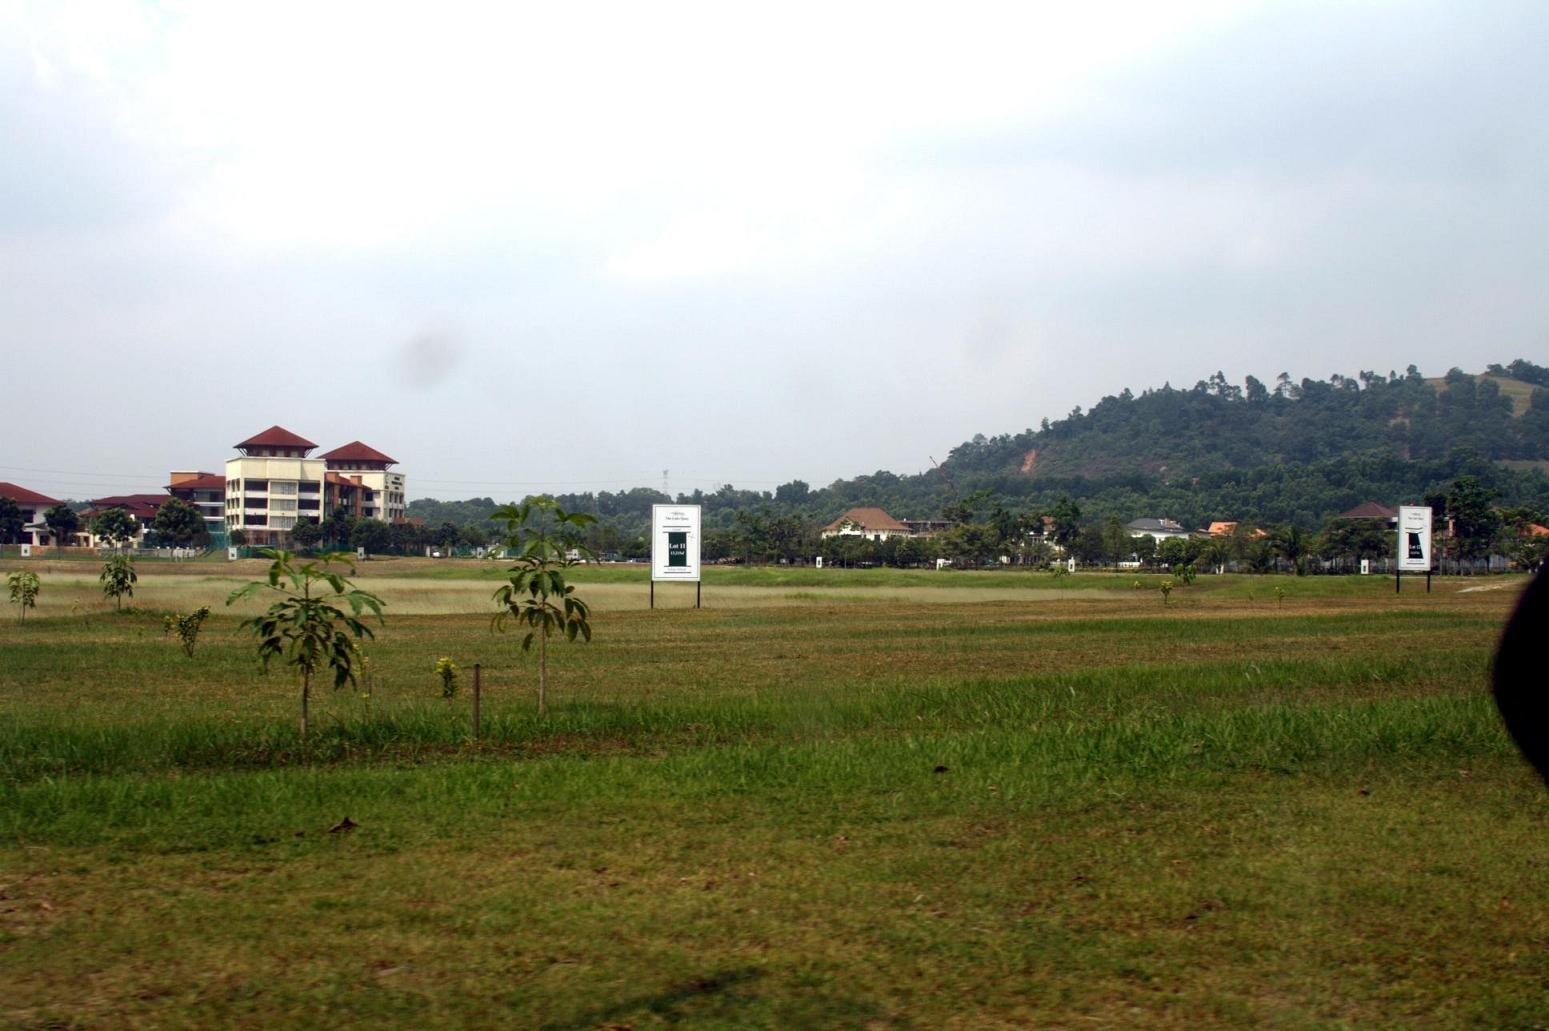 Mines South Lake Bungalow Lots For Sale, Near Australian International School Malaysia (Aism) , Mines, Kuala Lumpur, Malaysia